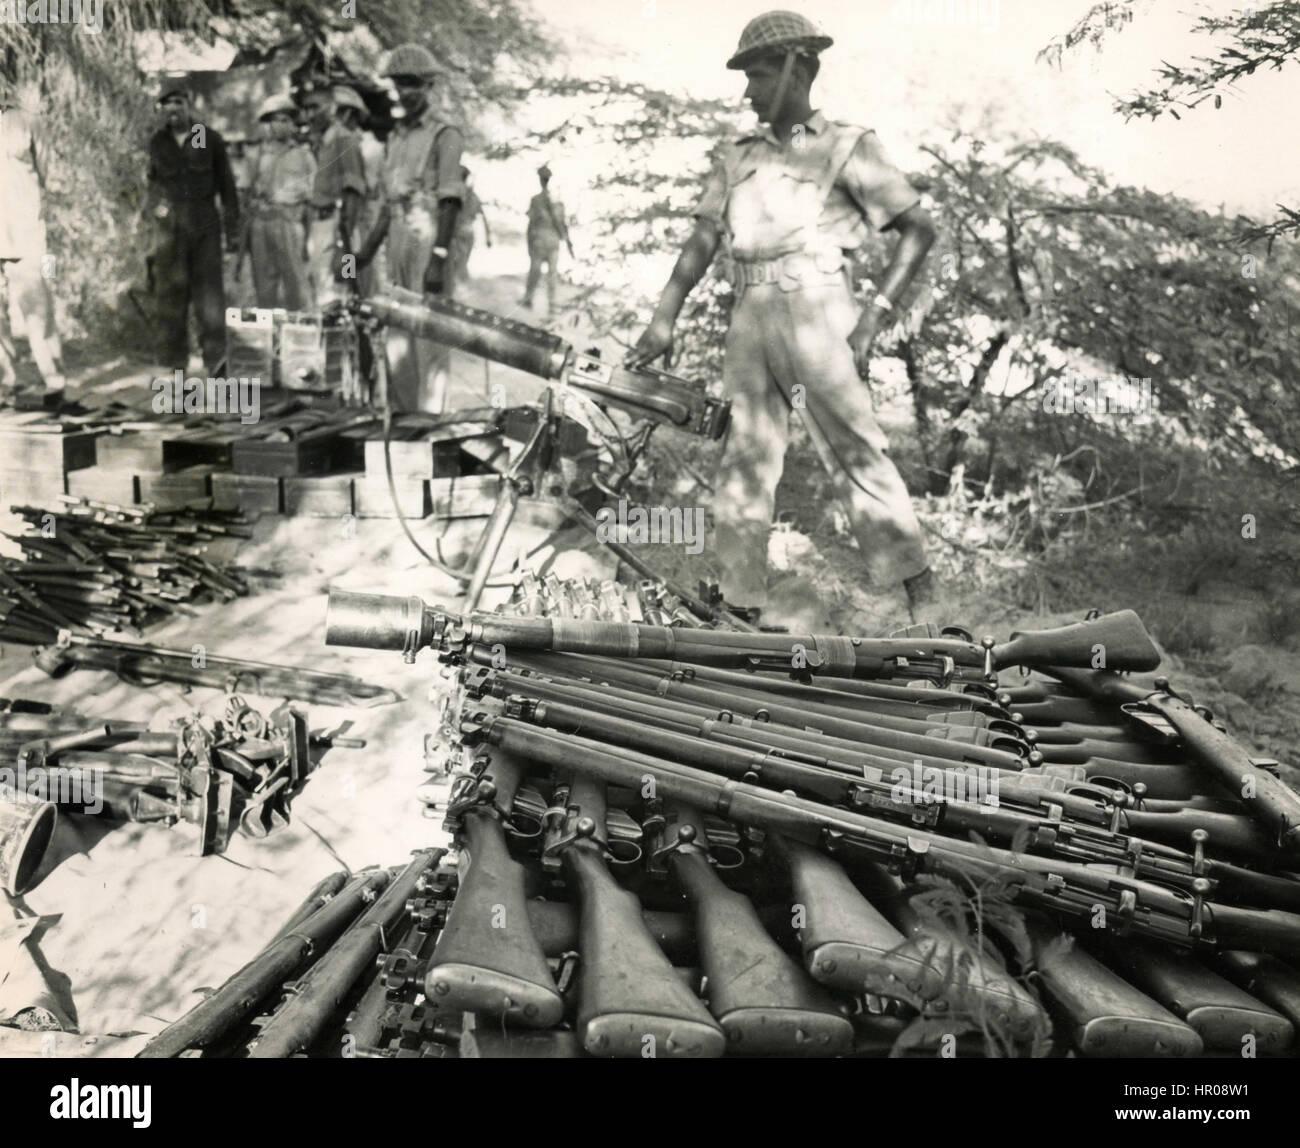 Apilando rifles militares pakistaníes, Pakistán 1965 Imagen De Stock